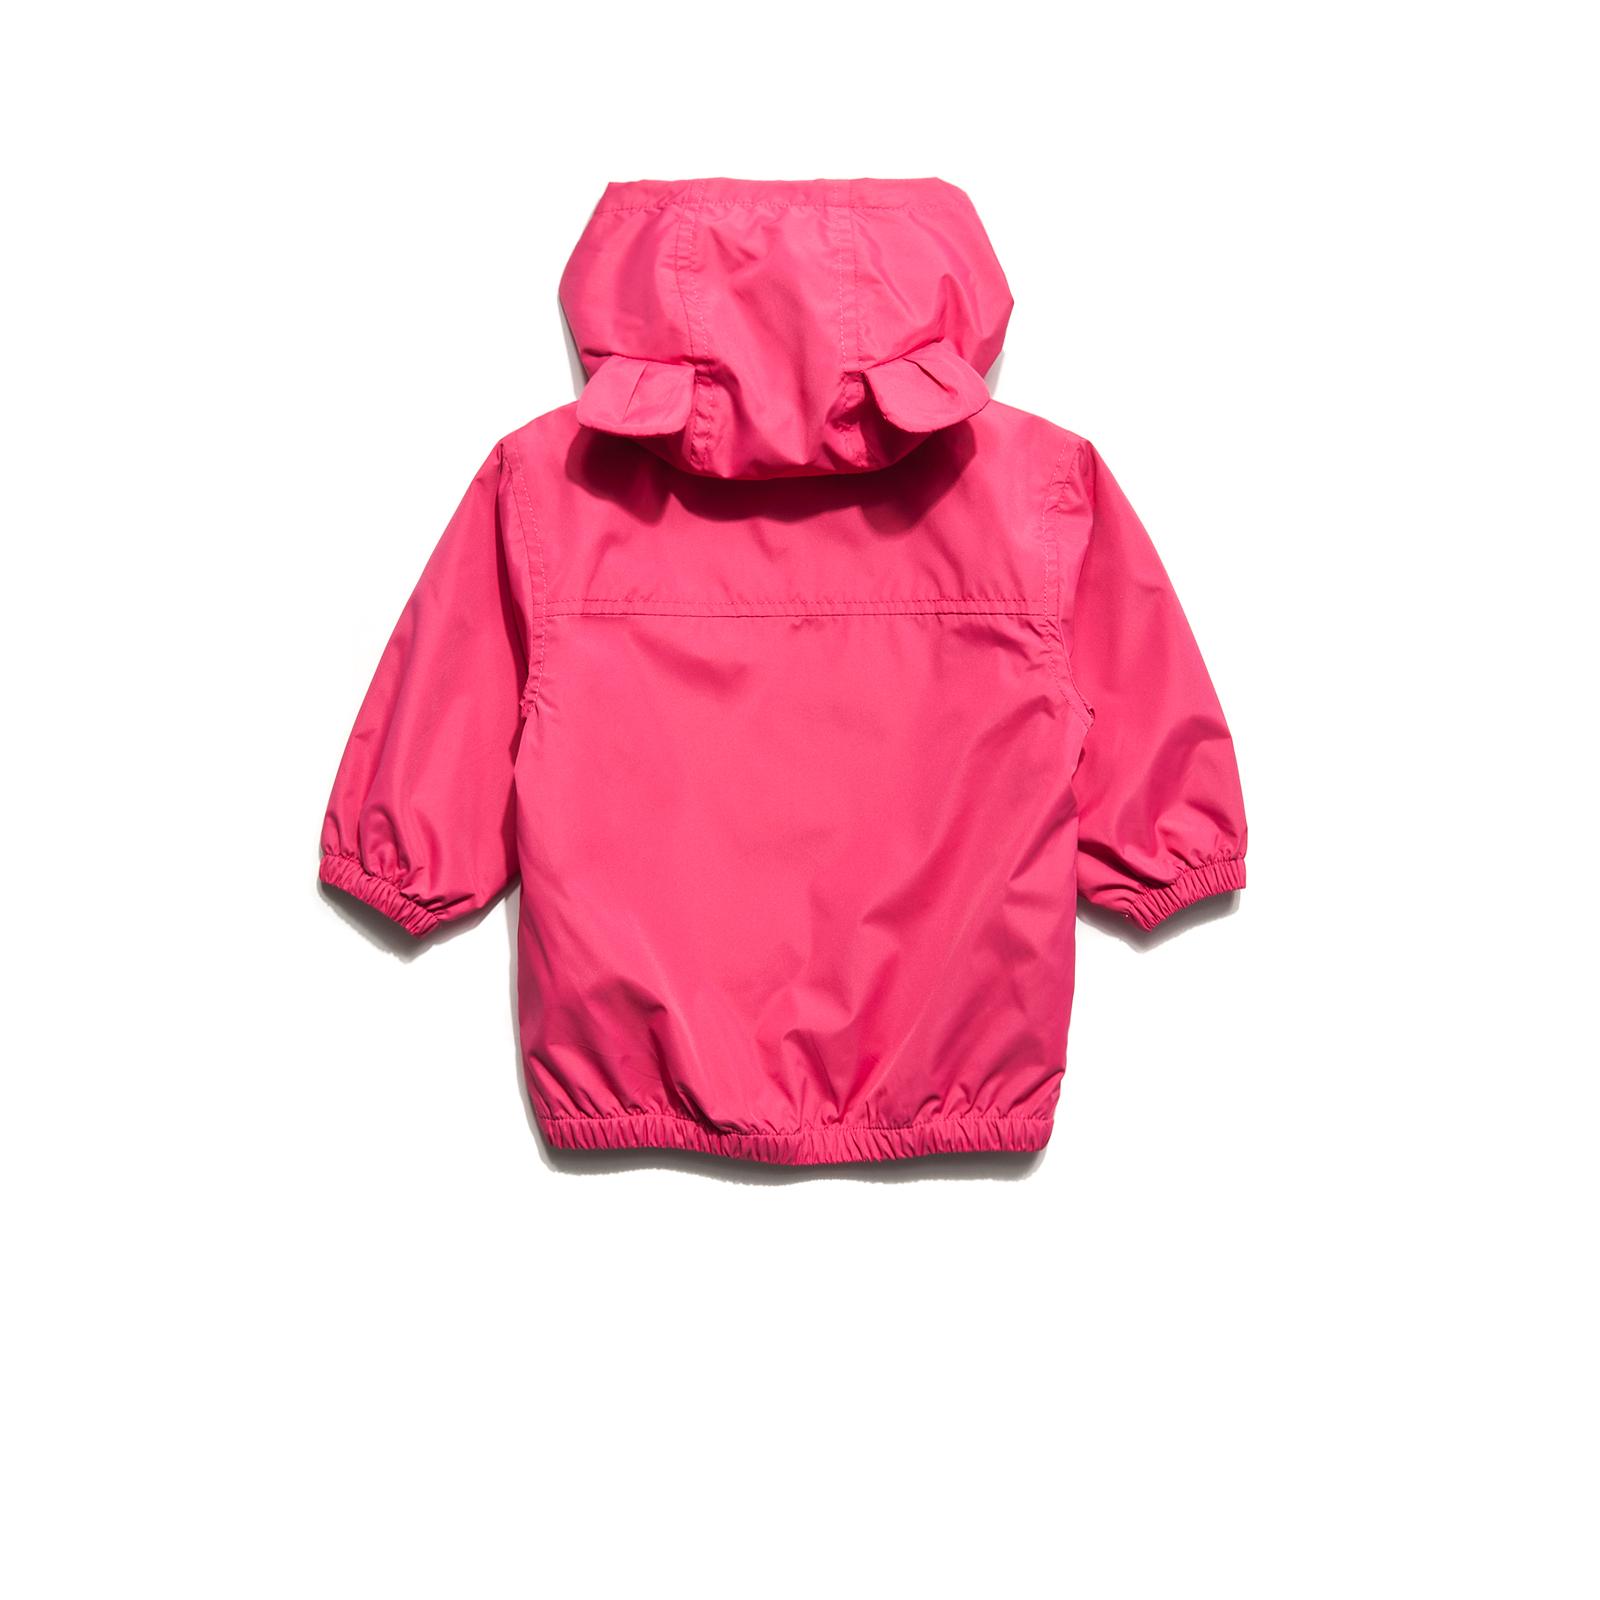 Куртка 5.10.15. Размер 68 от Младенец.ru